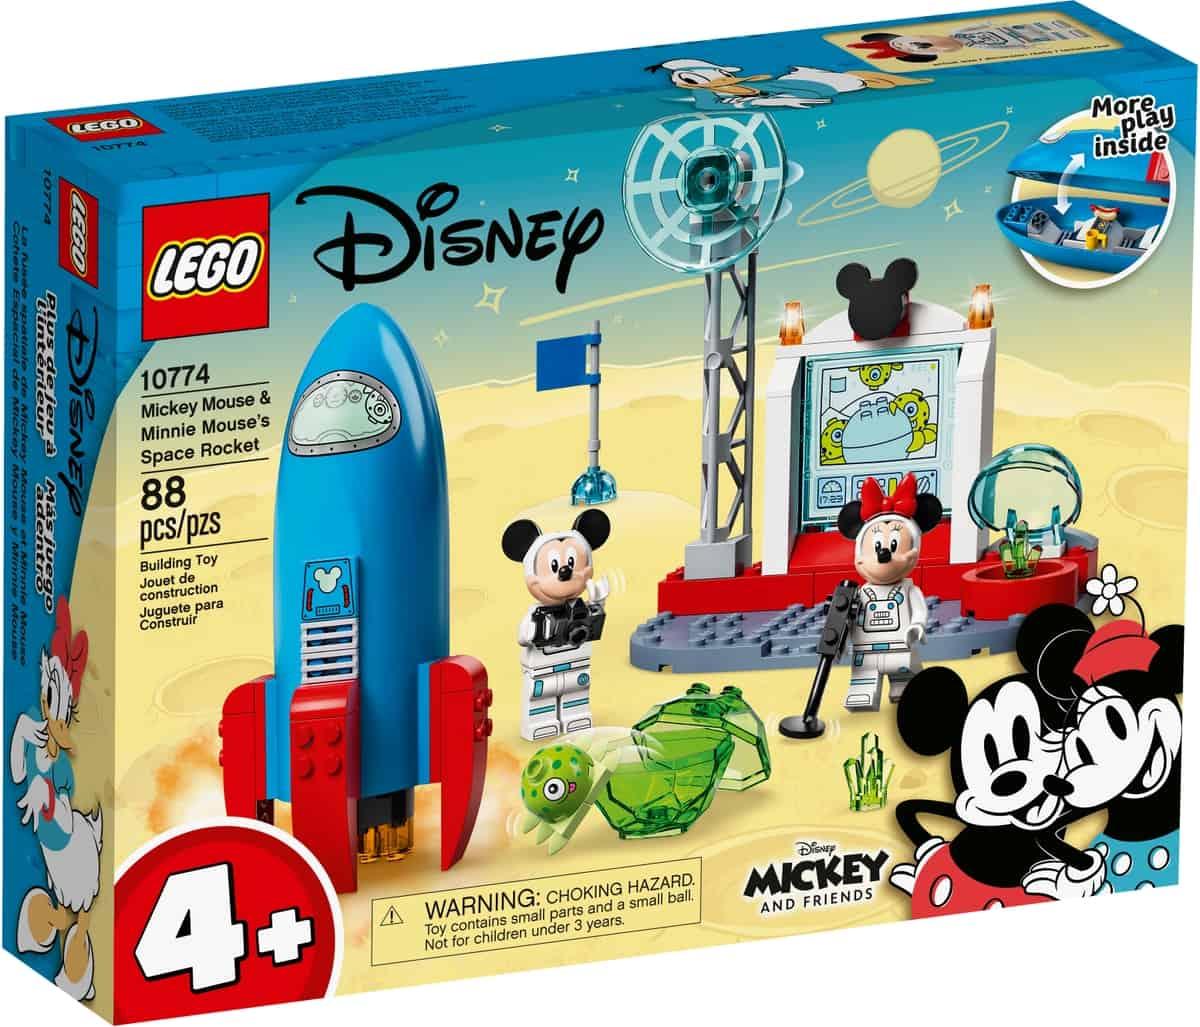 lego 10774 cohete espacial de mickey mouse y minnie mouse